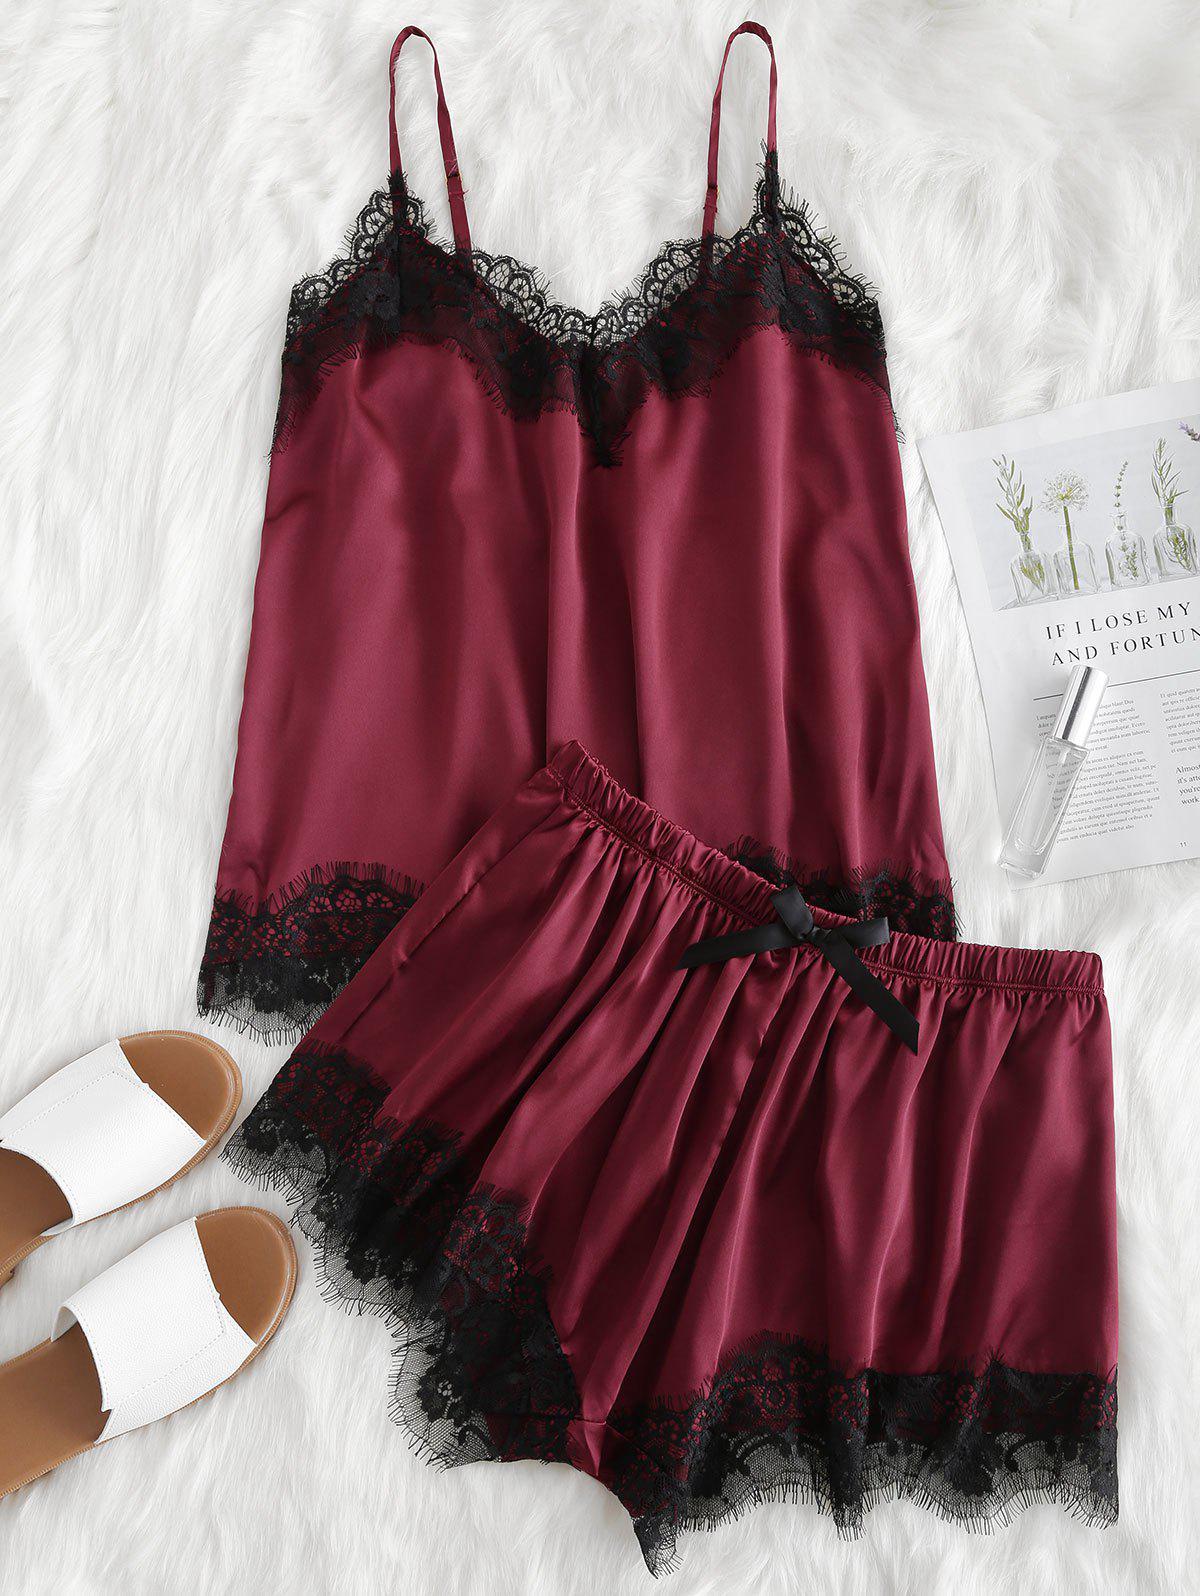 Contrast Lace Cami Satin Top and Shorts Pajama Set